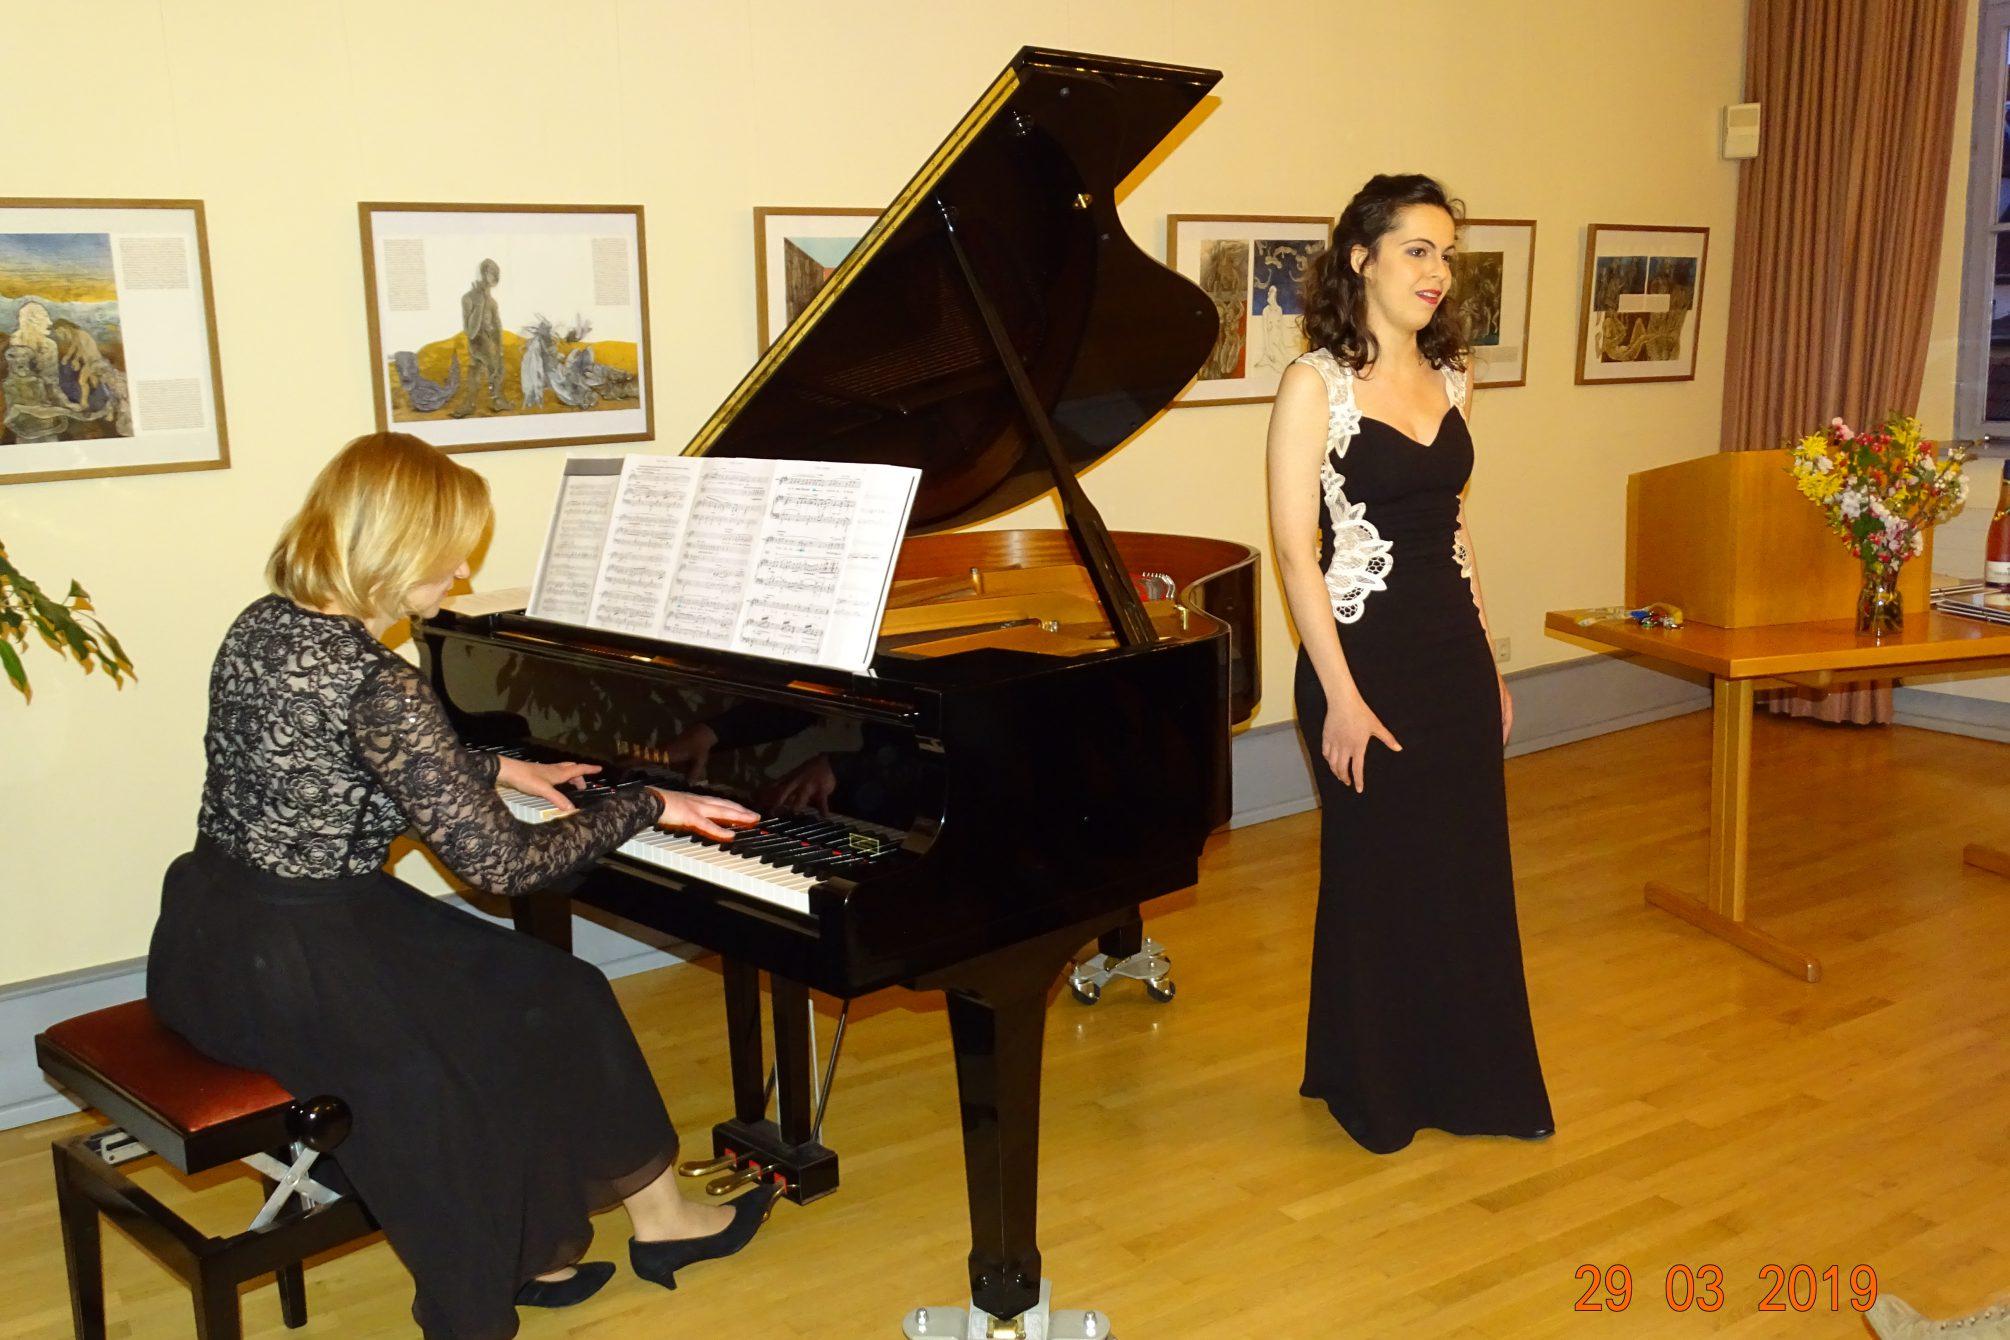 Olga Lenkeit am Flügel und Felicity Förster als Solistin